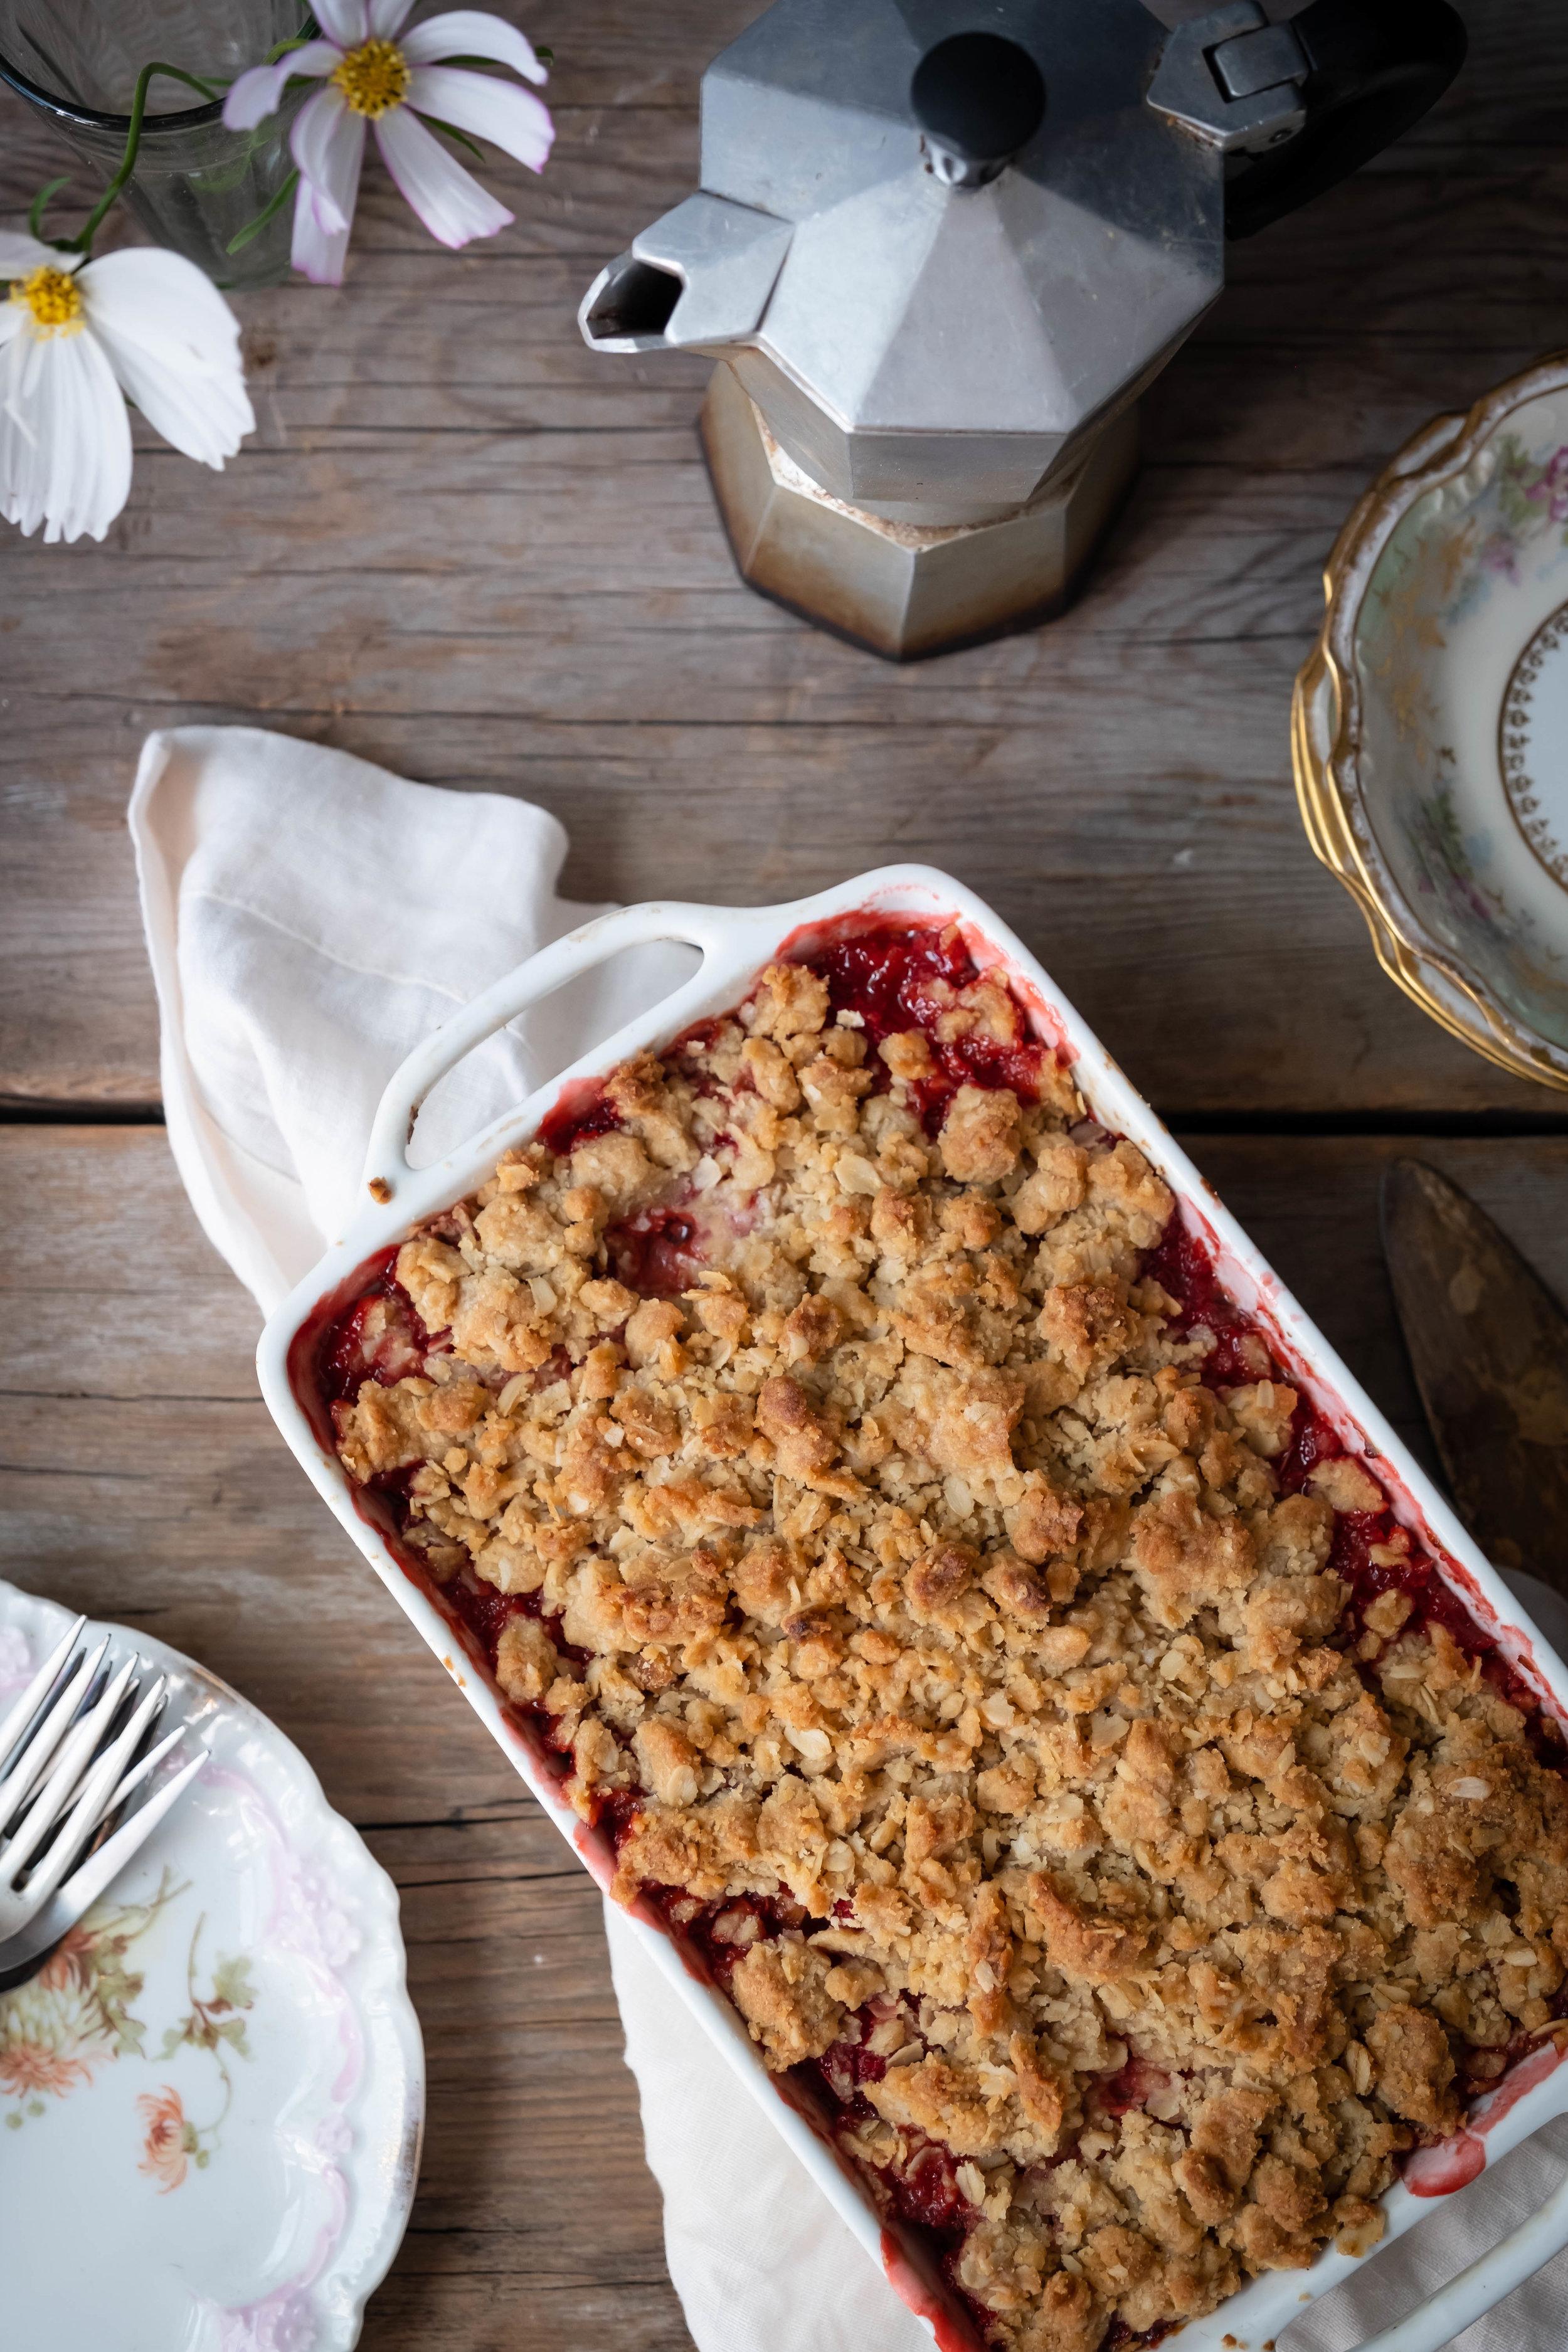 ROSE & IVY Strawberry Rhubarb Shortbread Bars